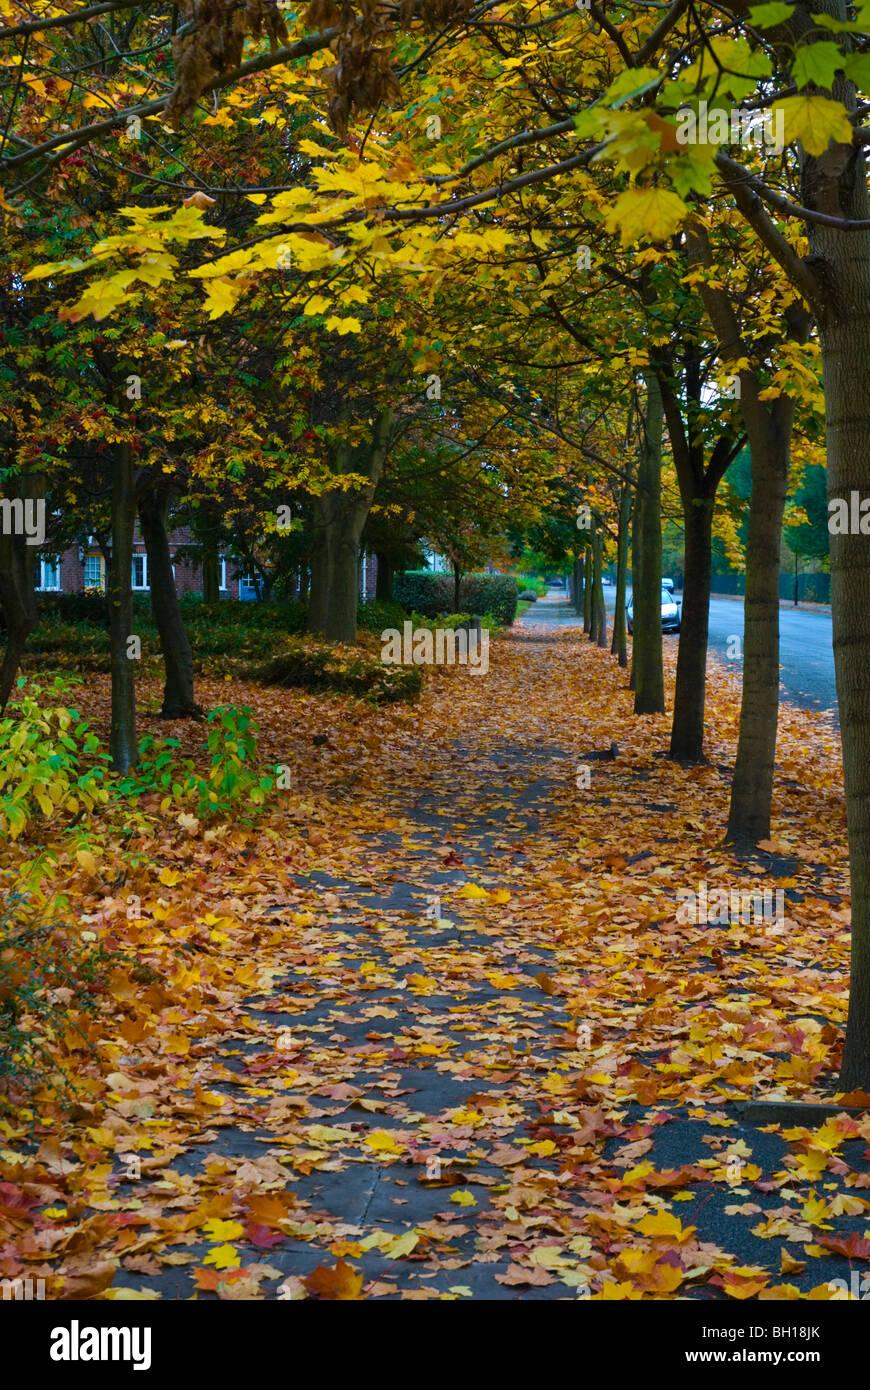 Autumn at Port Sunlight village Merseyside England UK Europe - Stock Image